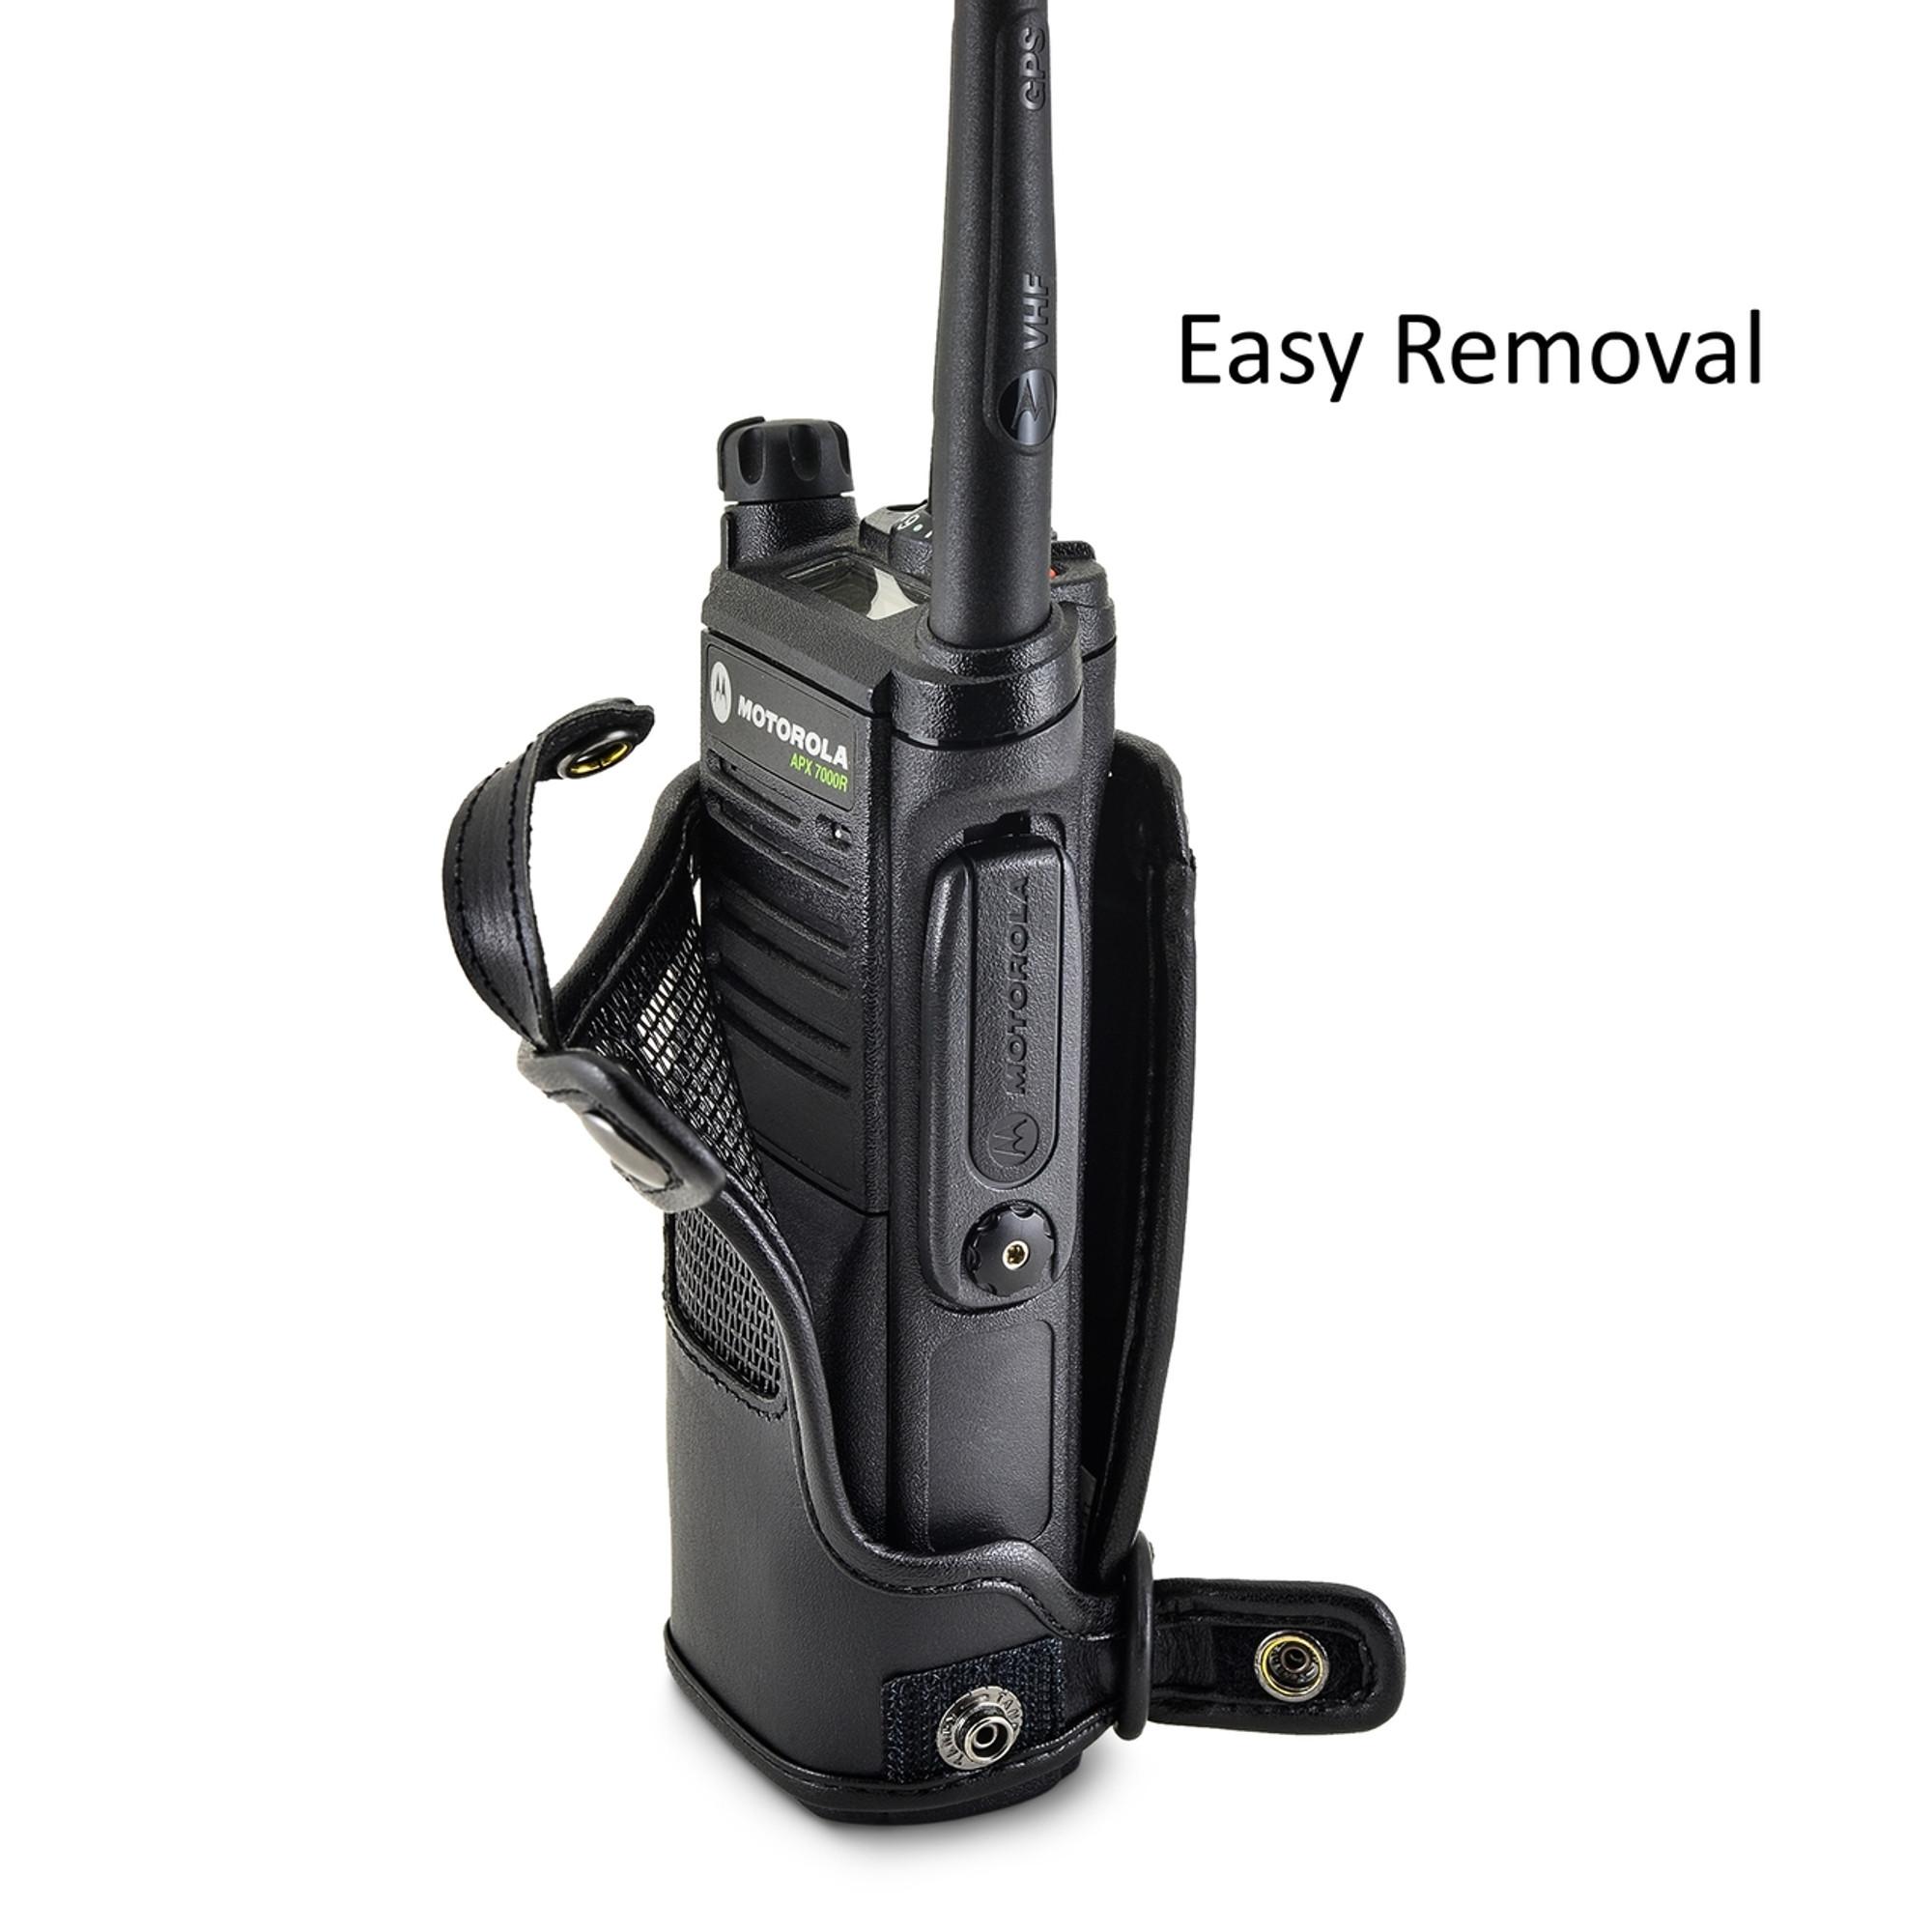 Radio holder motorola apx 6000 -  Motorola Apx 7000 Duty Belt Carry Holder Case Black Leather Holster With Heavy Duty Rotating Belt